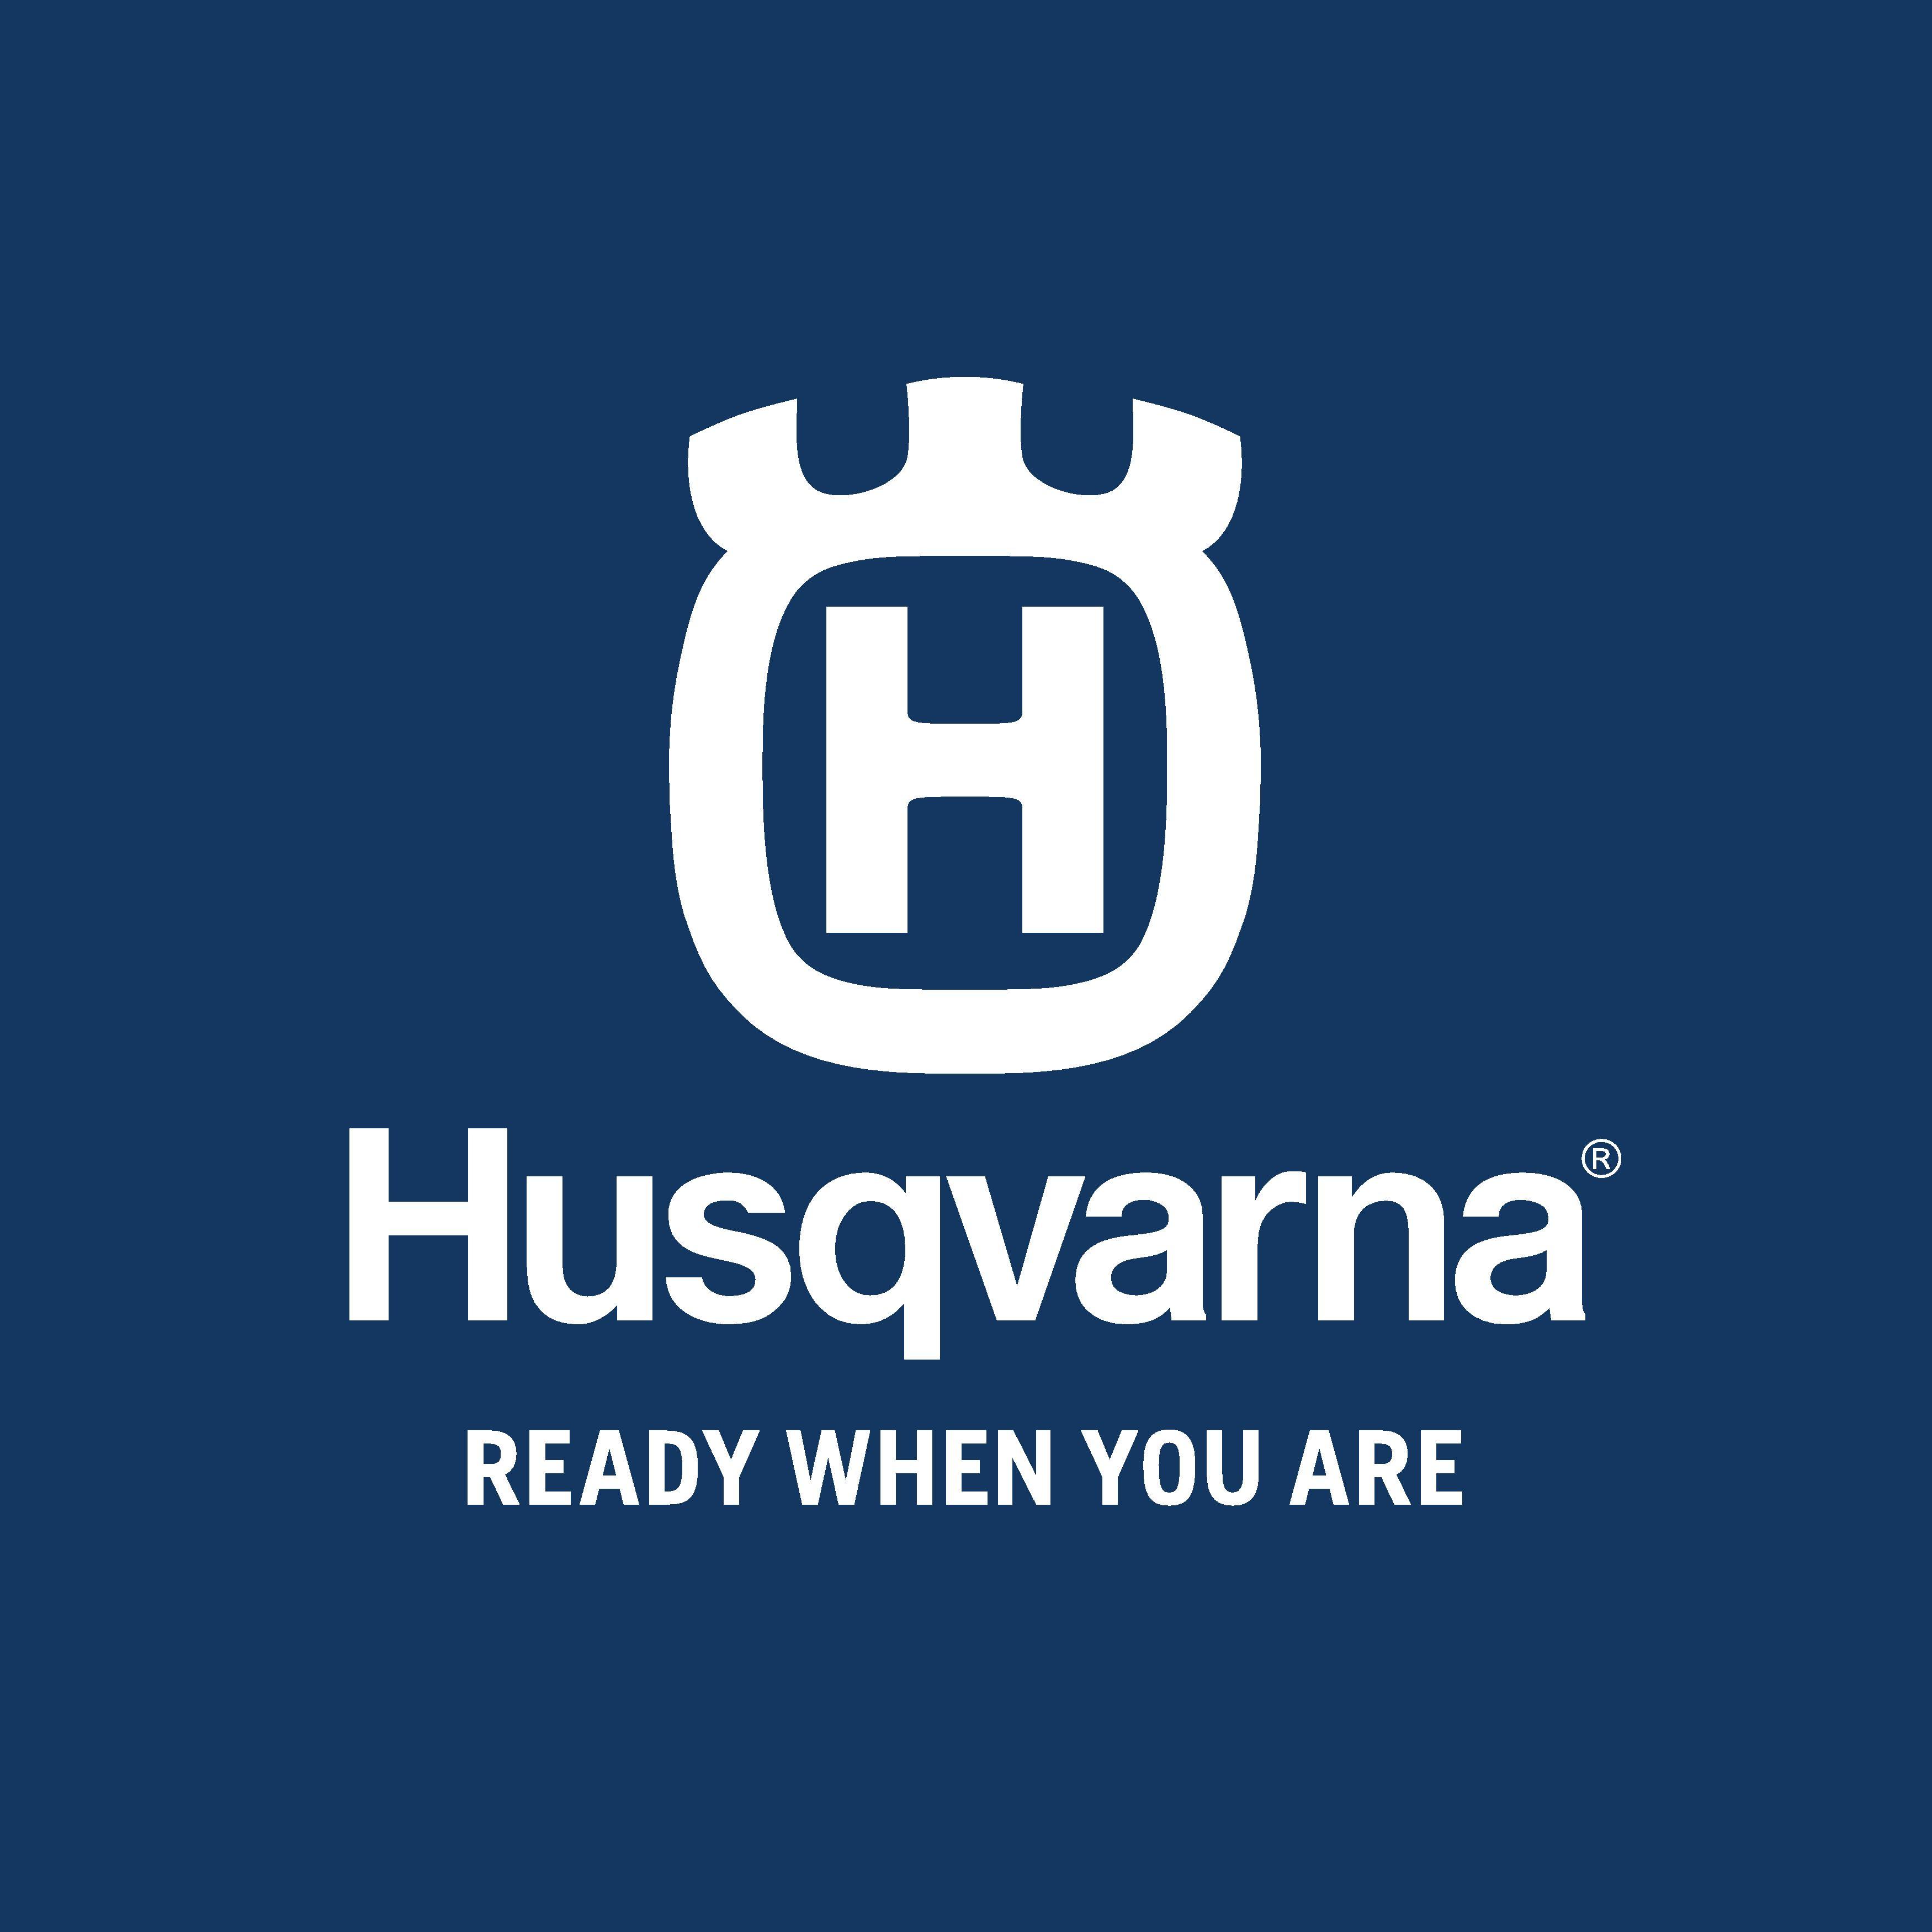 TodoHusqvarna.com